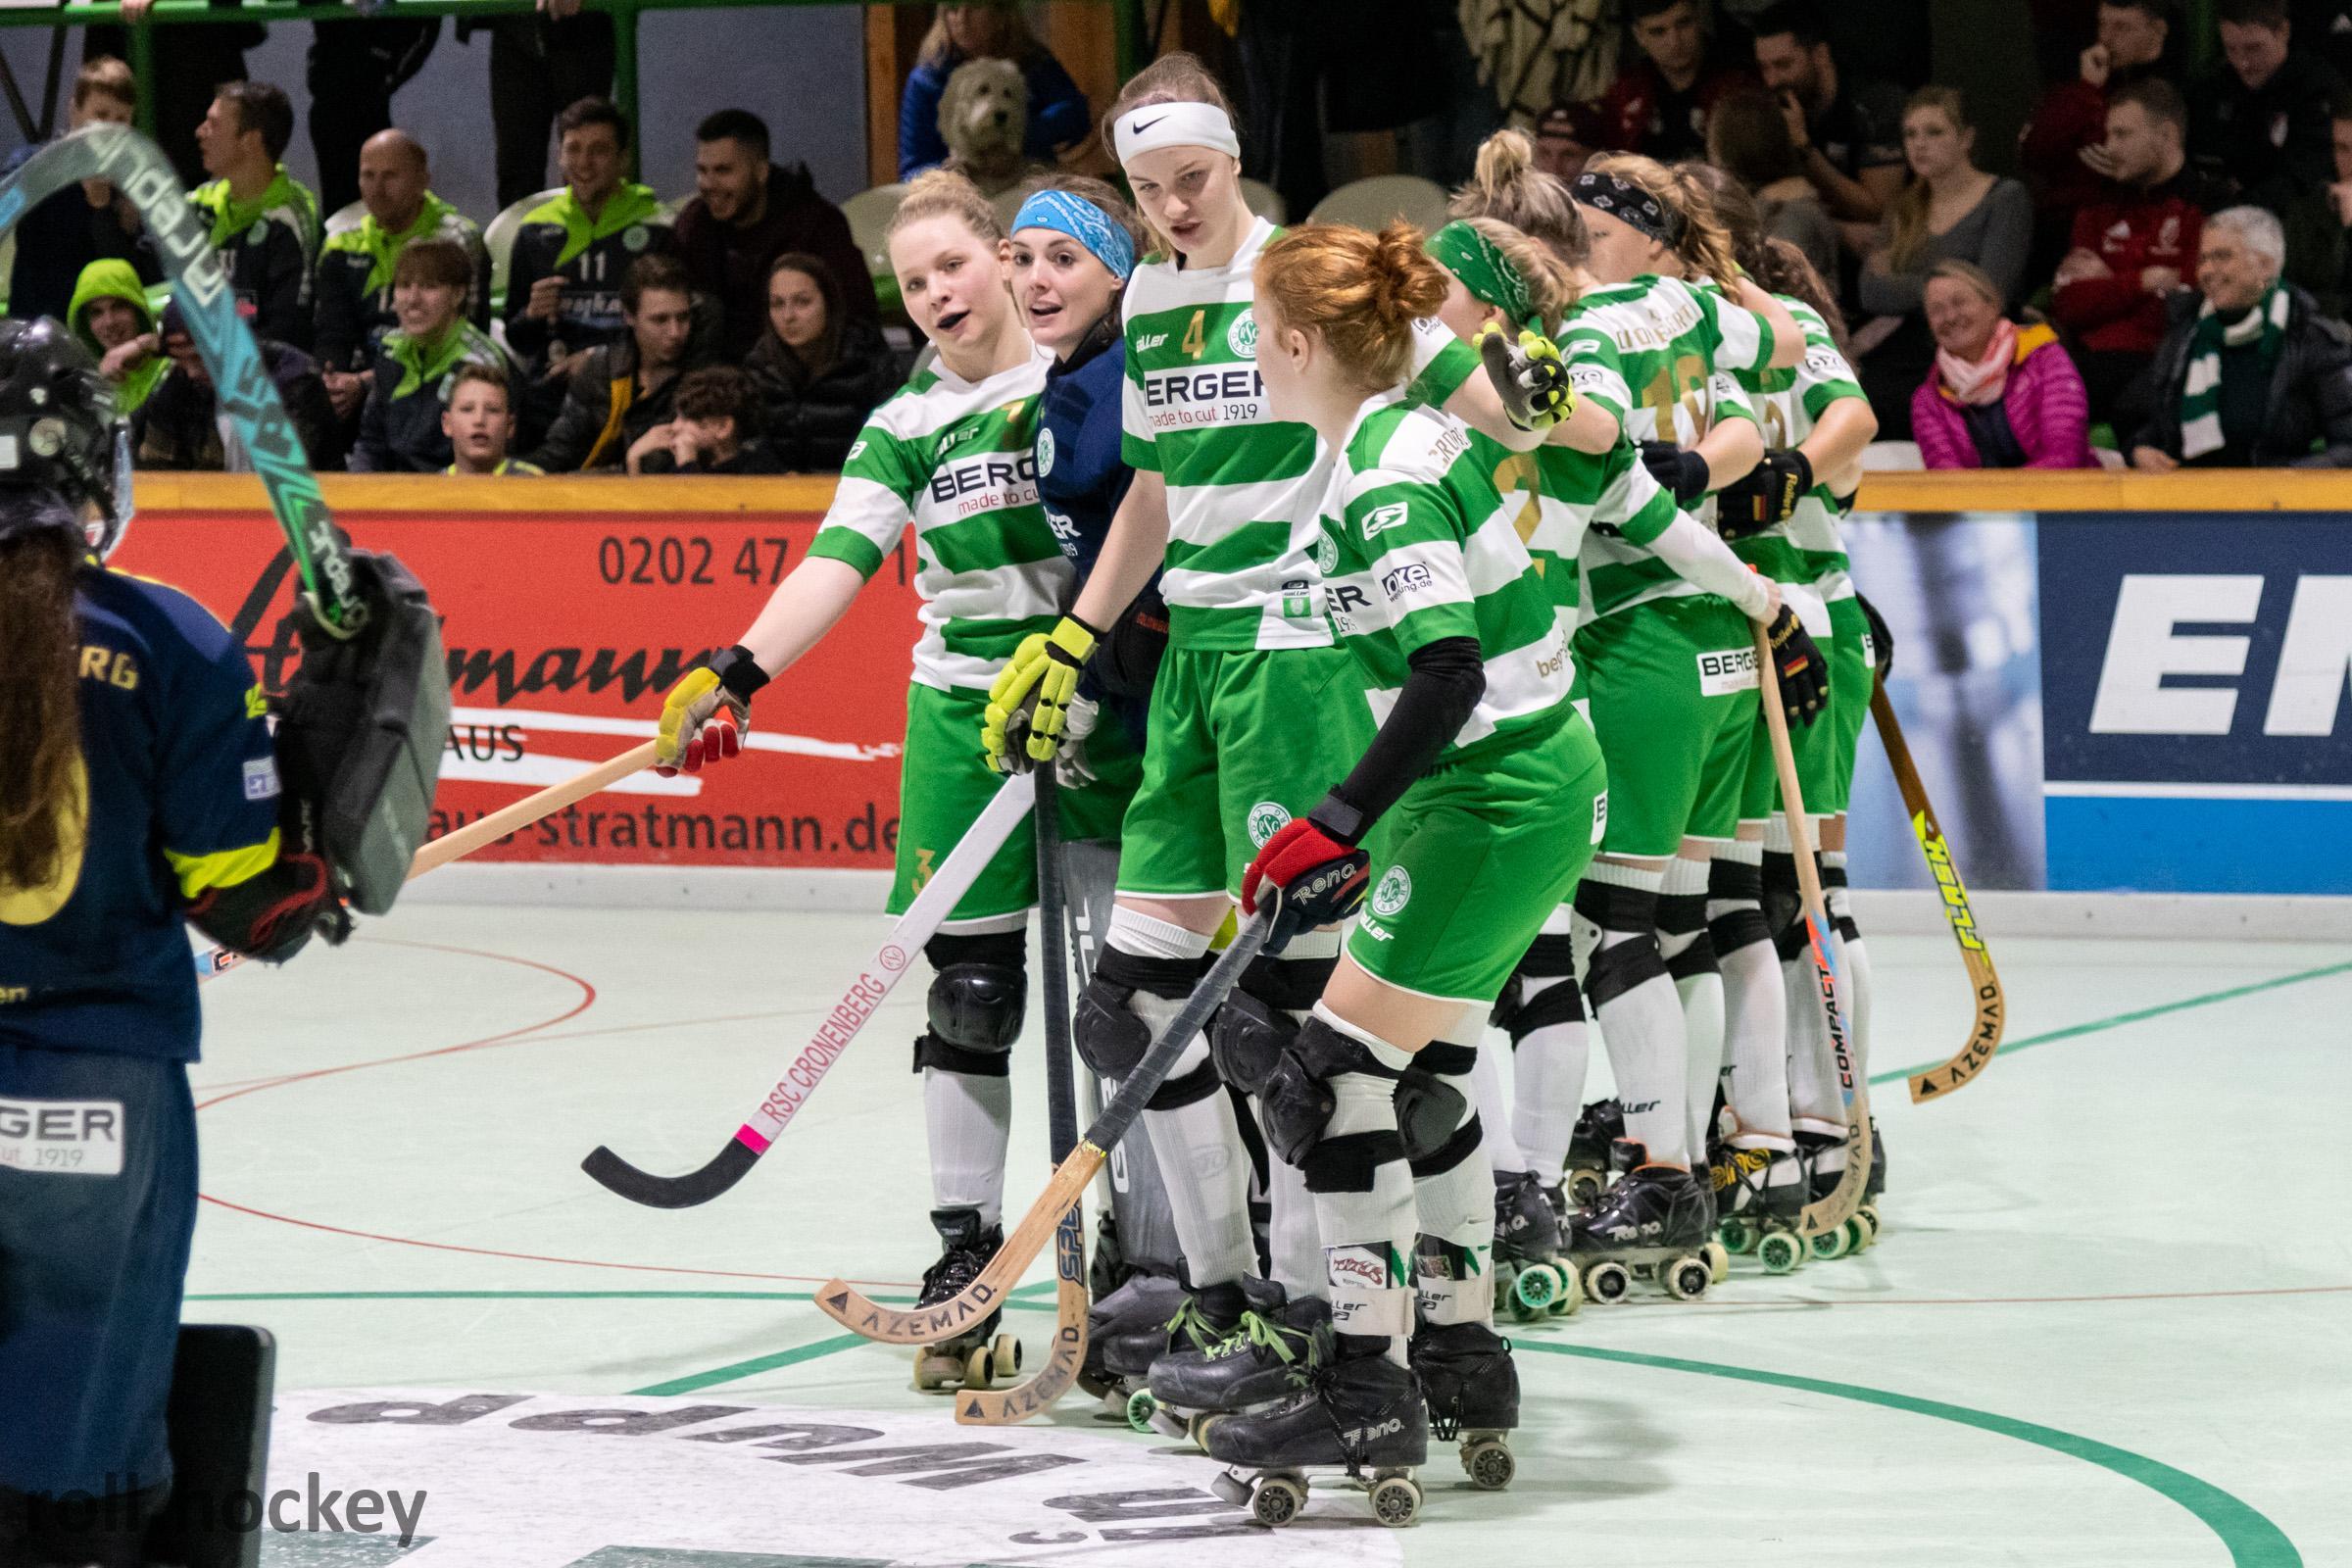 RSC Cronenberg Rollhockey Bundesliga Damen Spieltag 23.11.2019